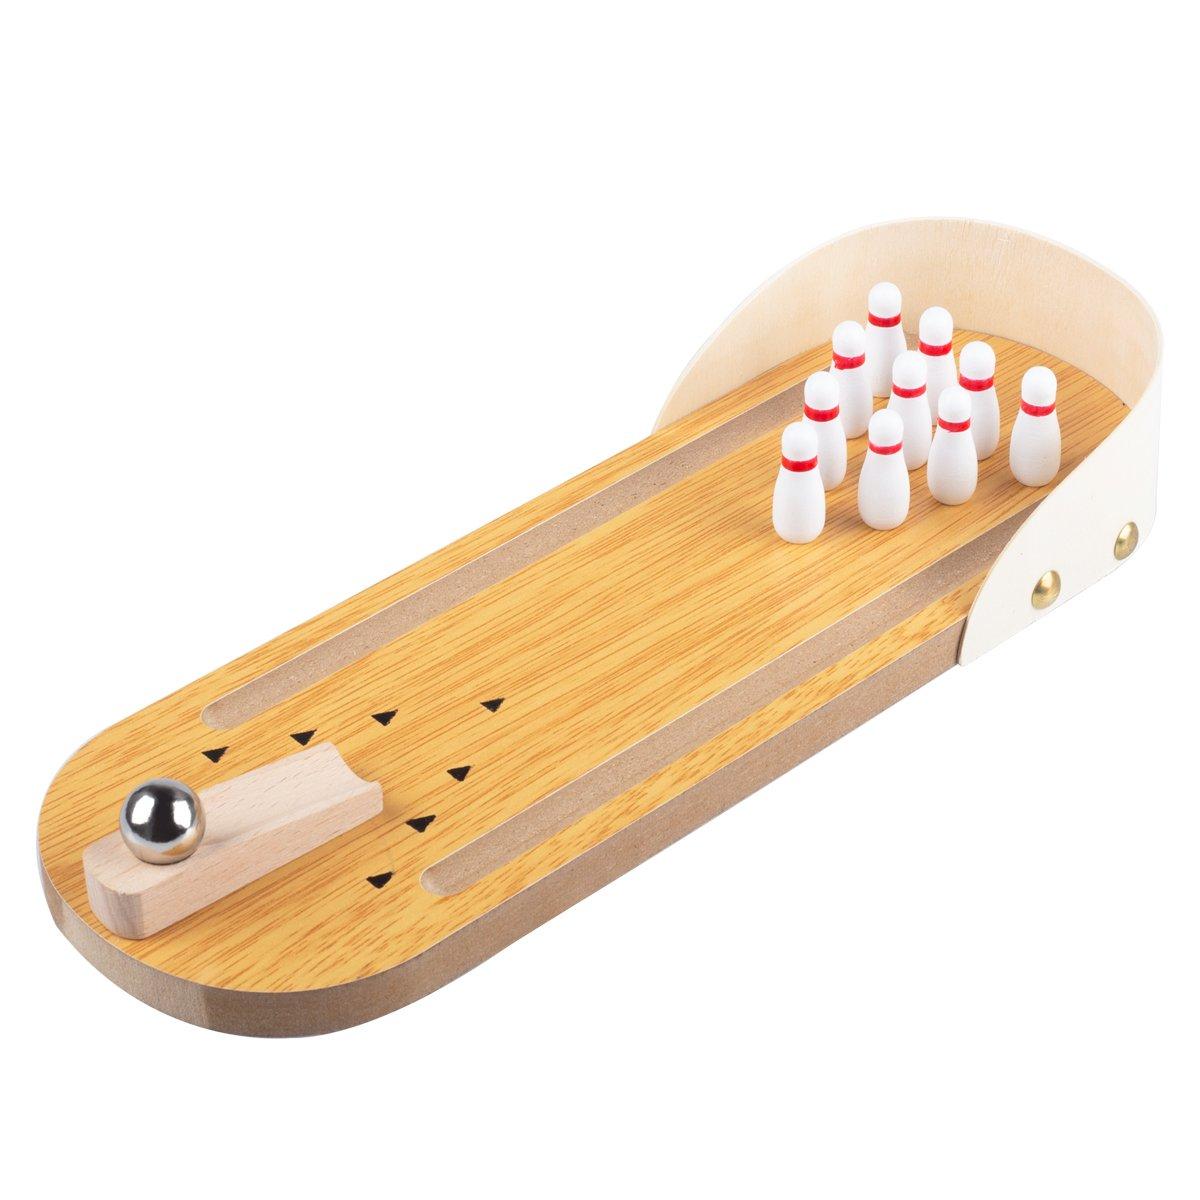 Mini Agomo Game Bowling Game Set, Agomo Set, Mini木製デスクトップボーリングのゲームの子供と大人、簡単に組み立て、再生、ギフト B07DJ4T564, 釈地農園:d36ca068 --- lembahbougenville.com